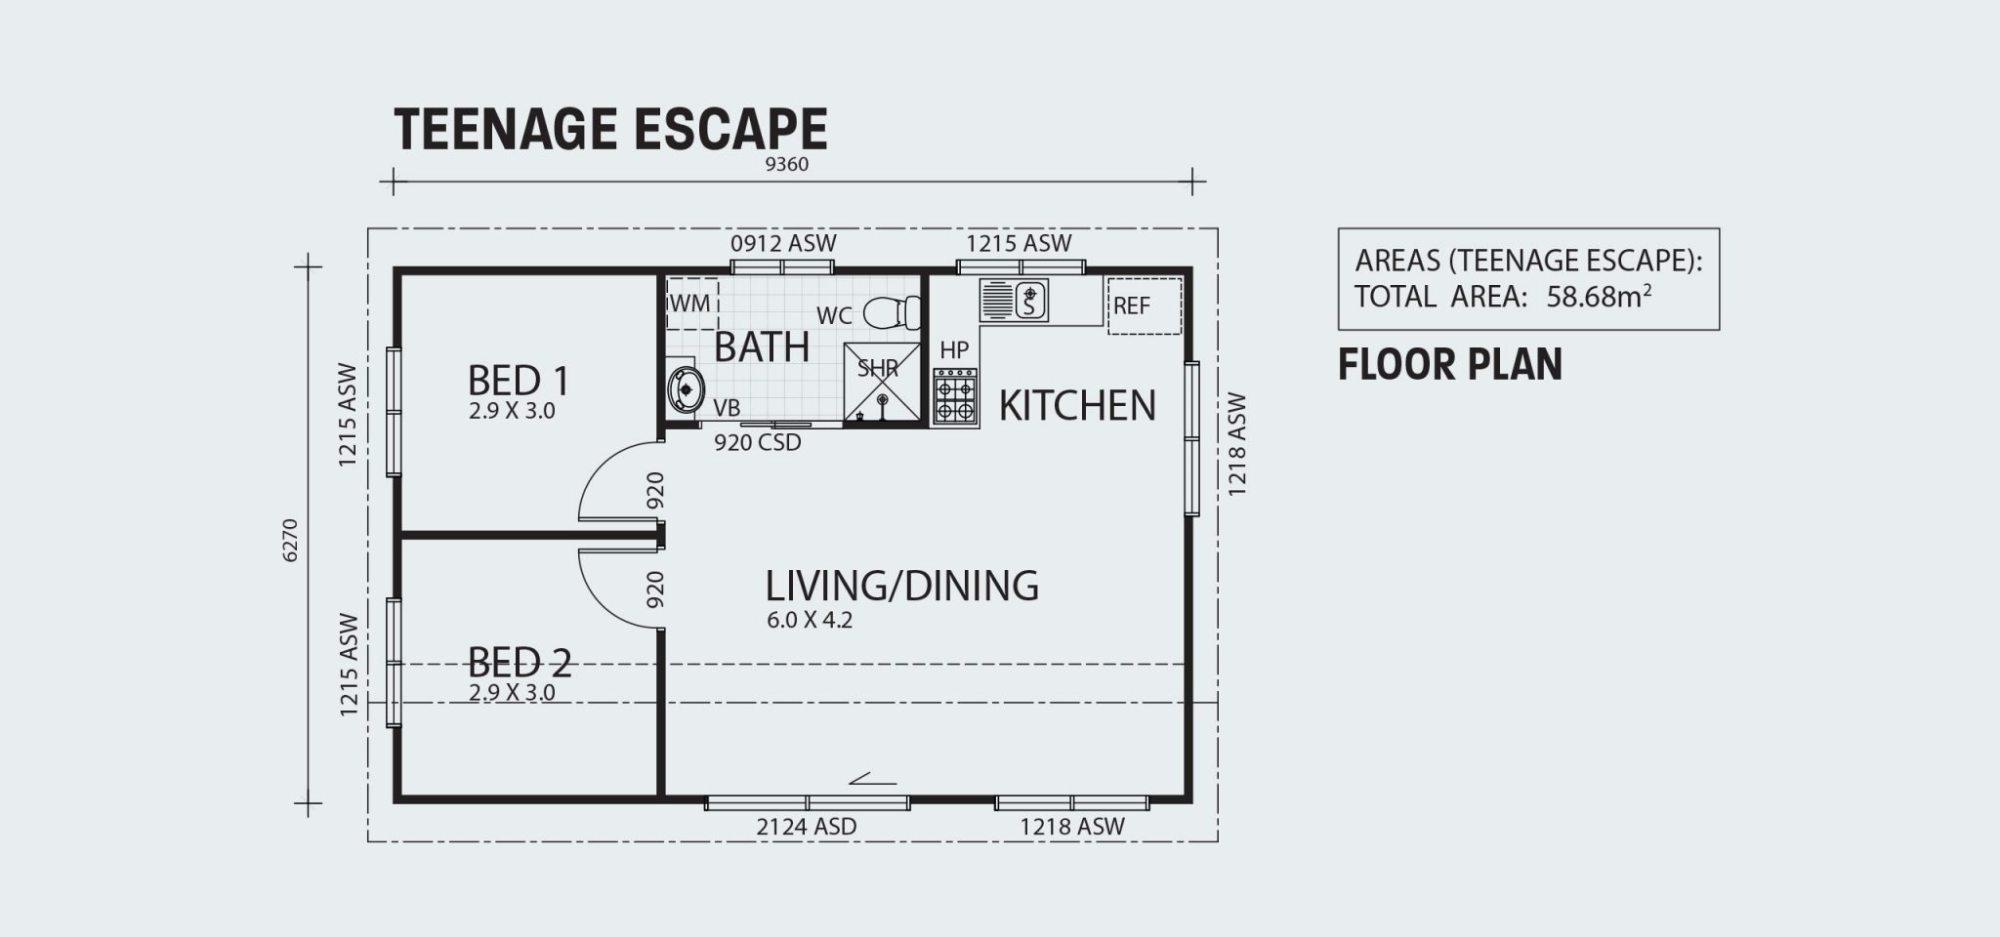 hight resolution of teenage escape r58 floorplan